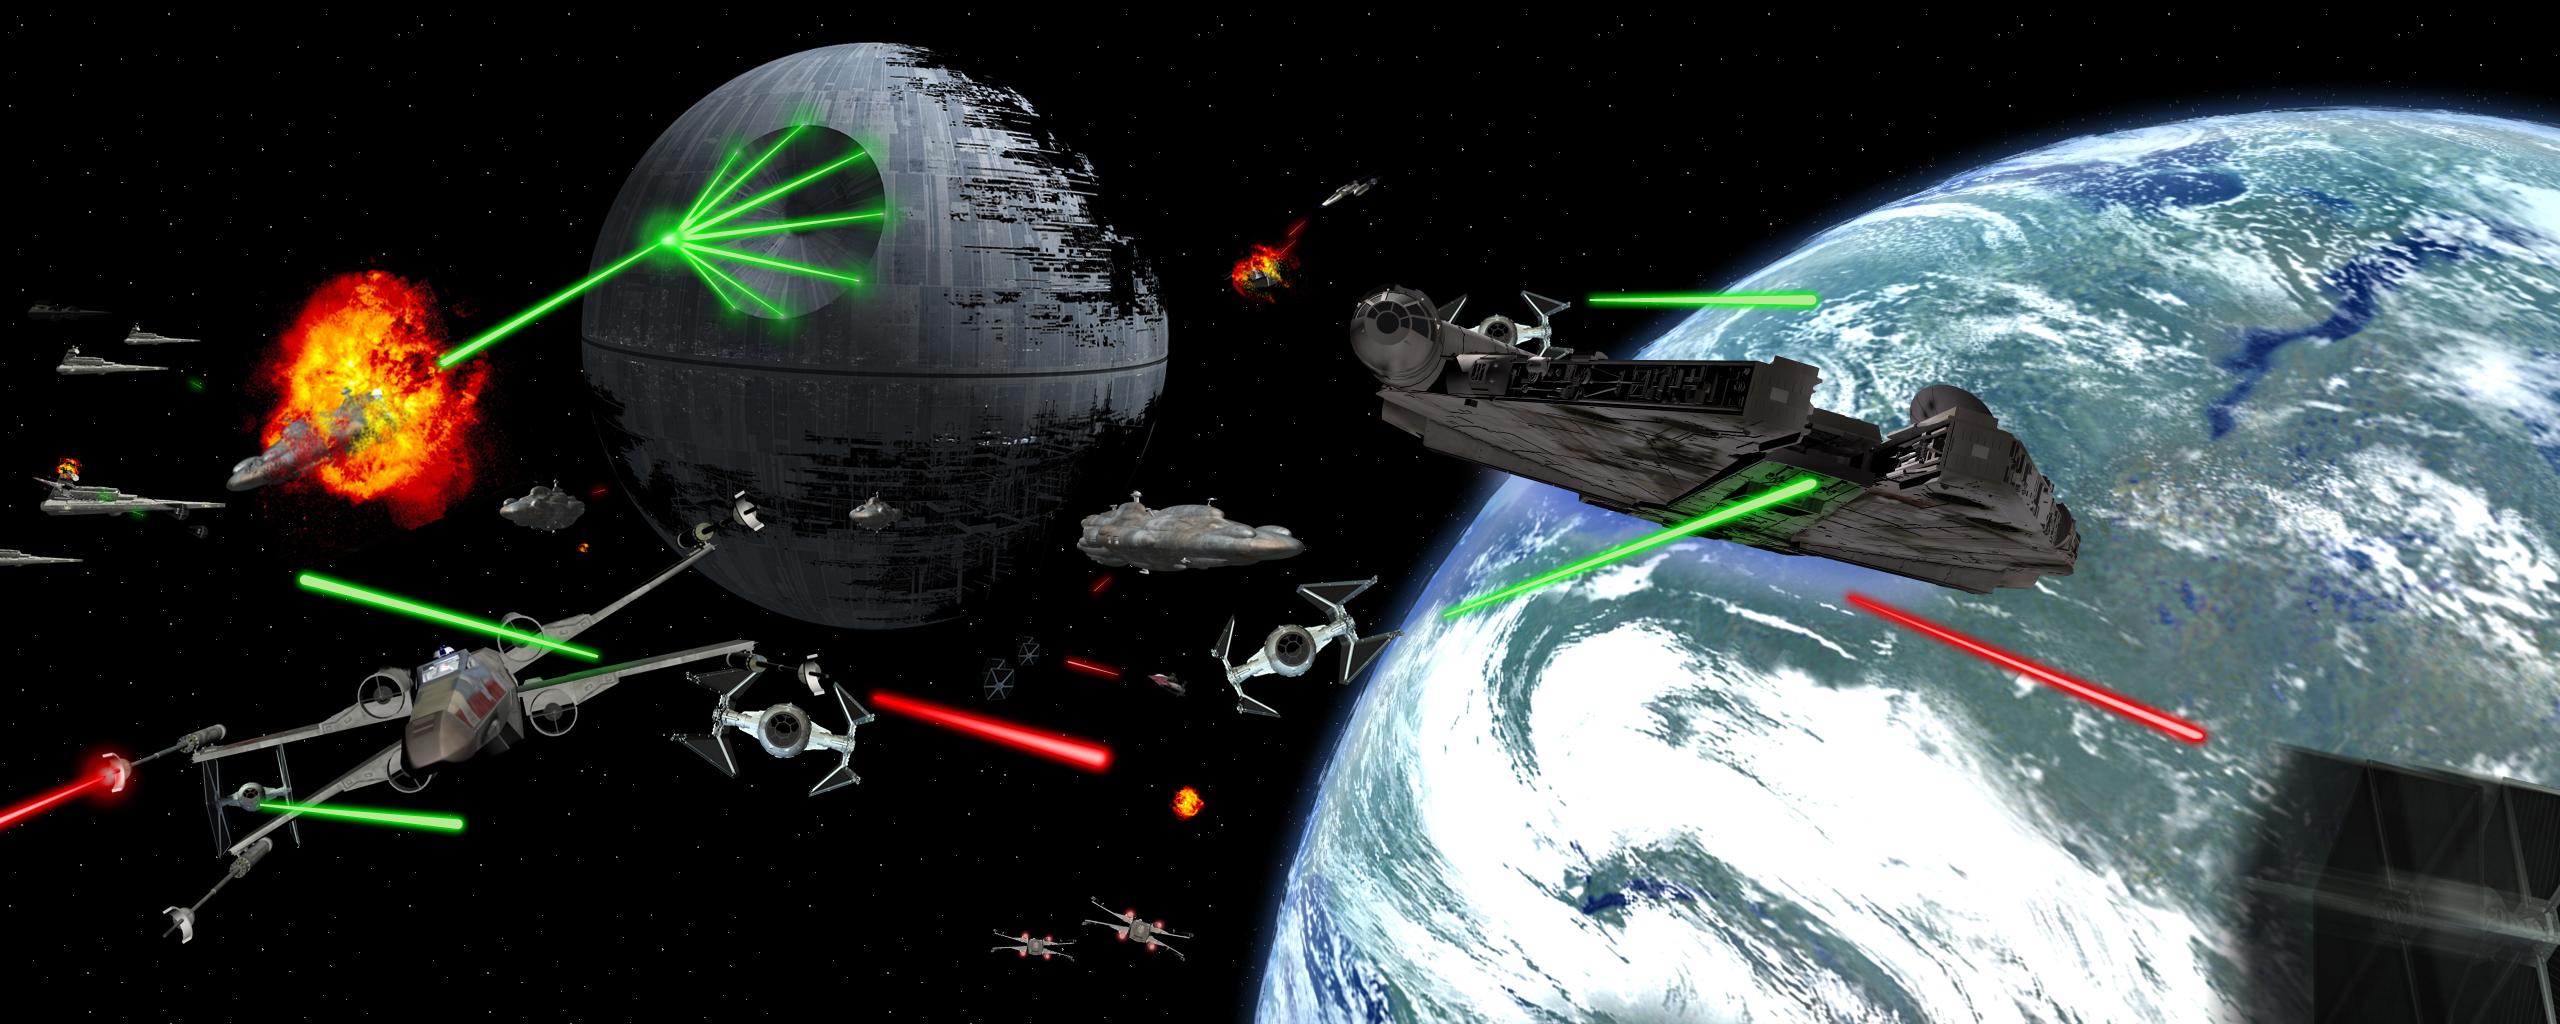 Star Wars Space Battle Wallpaper The battle of endor by goyneyjpg 2560x1024